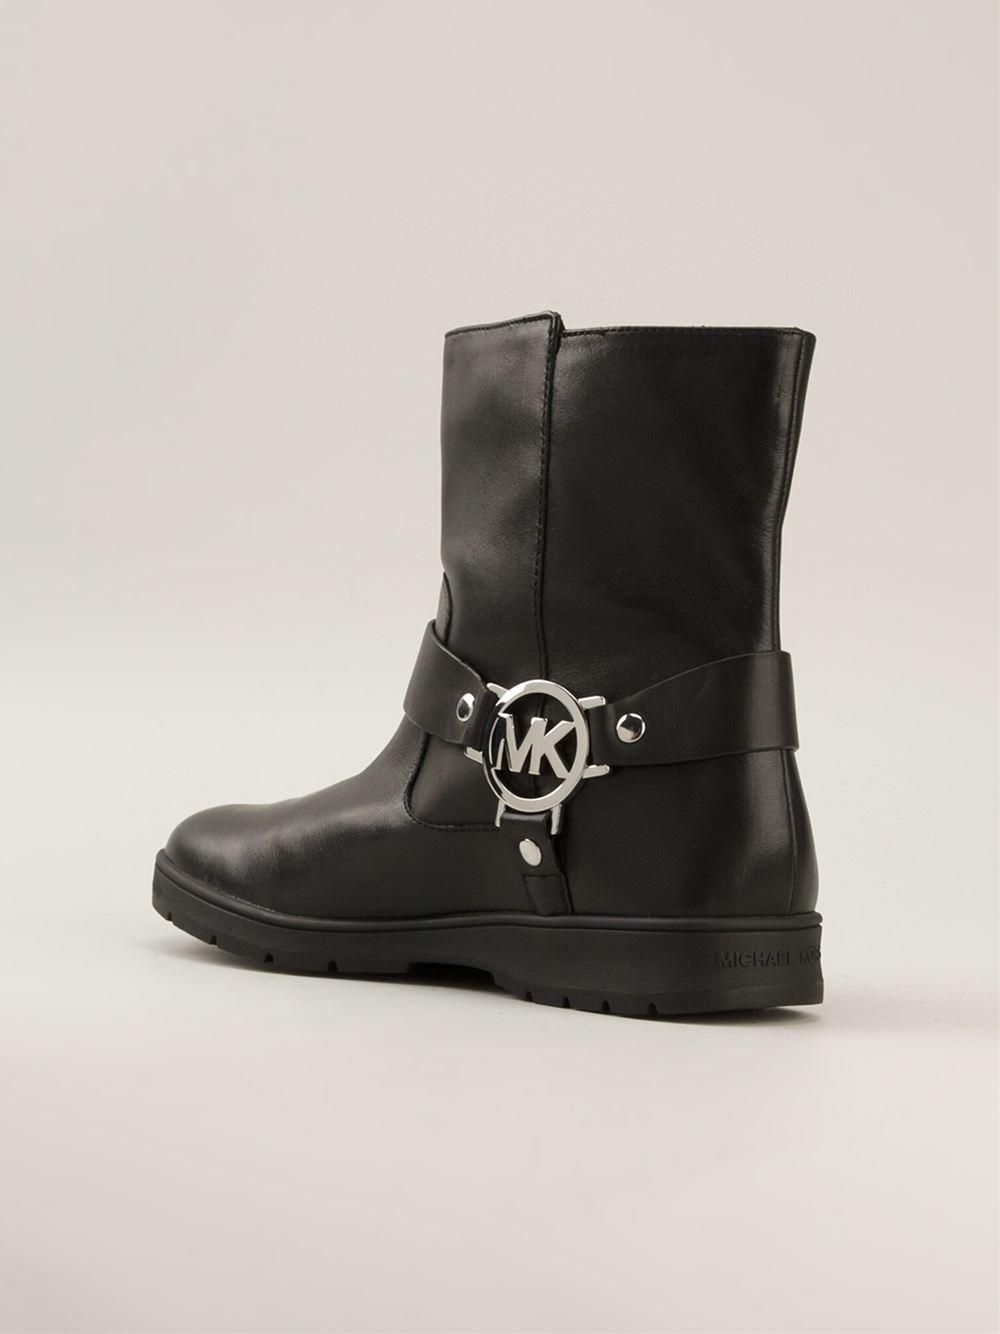 Lyst - Michael Kors 'Fulton' Biker Boots in Black